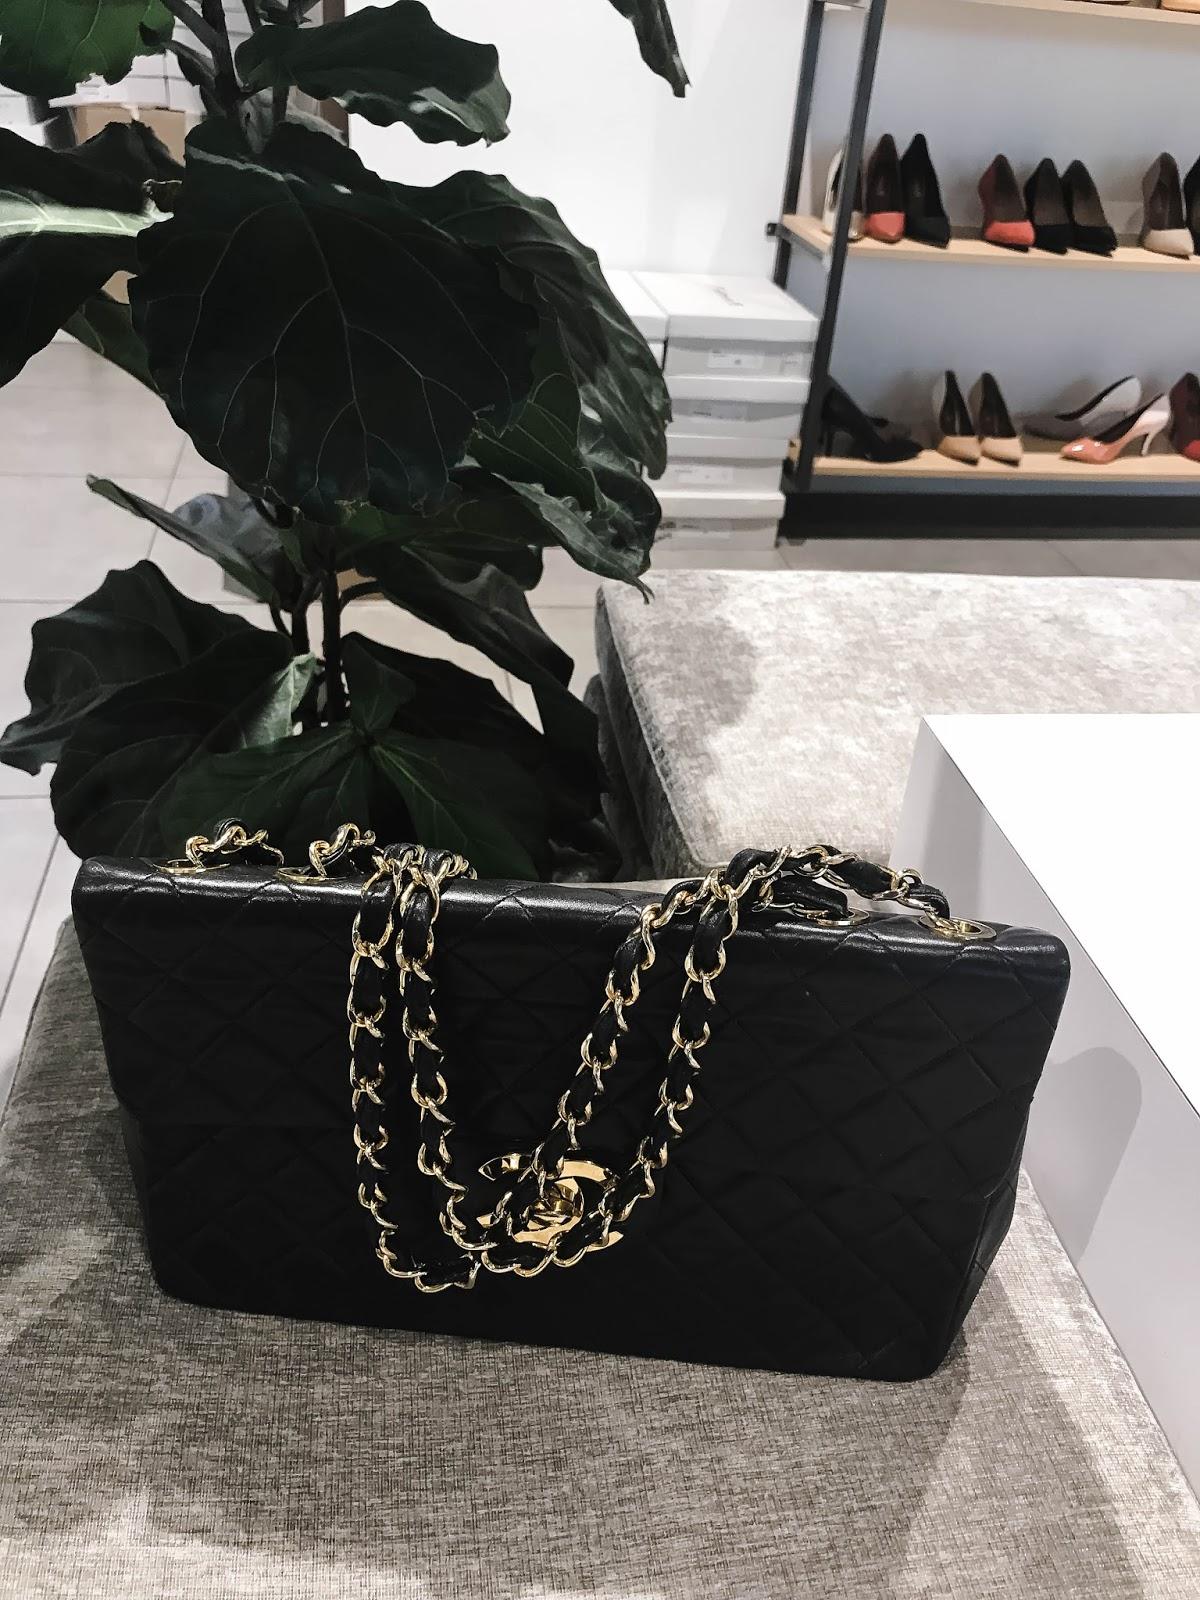 Chanel jumbo XL ebay ootd